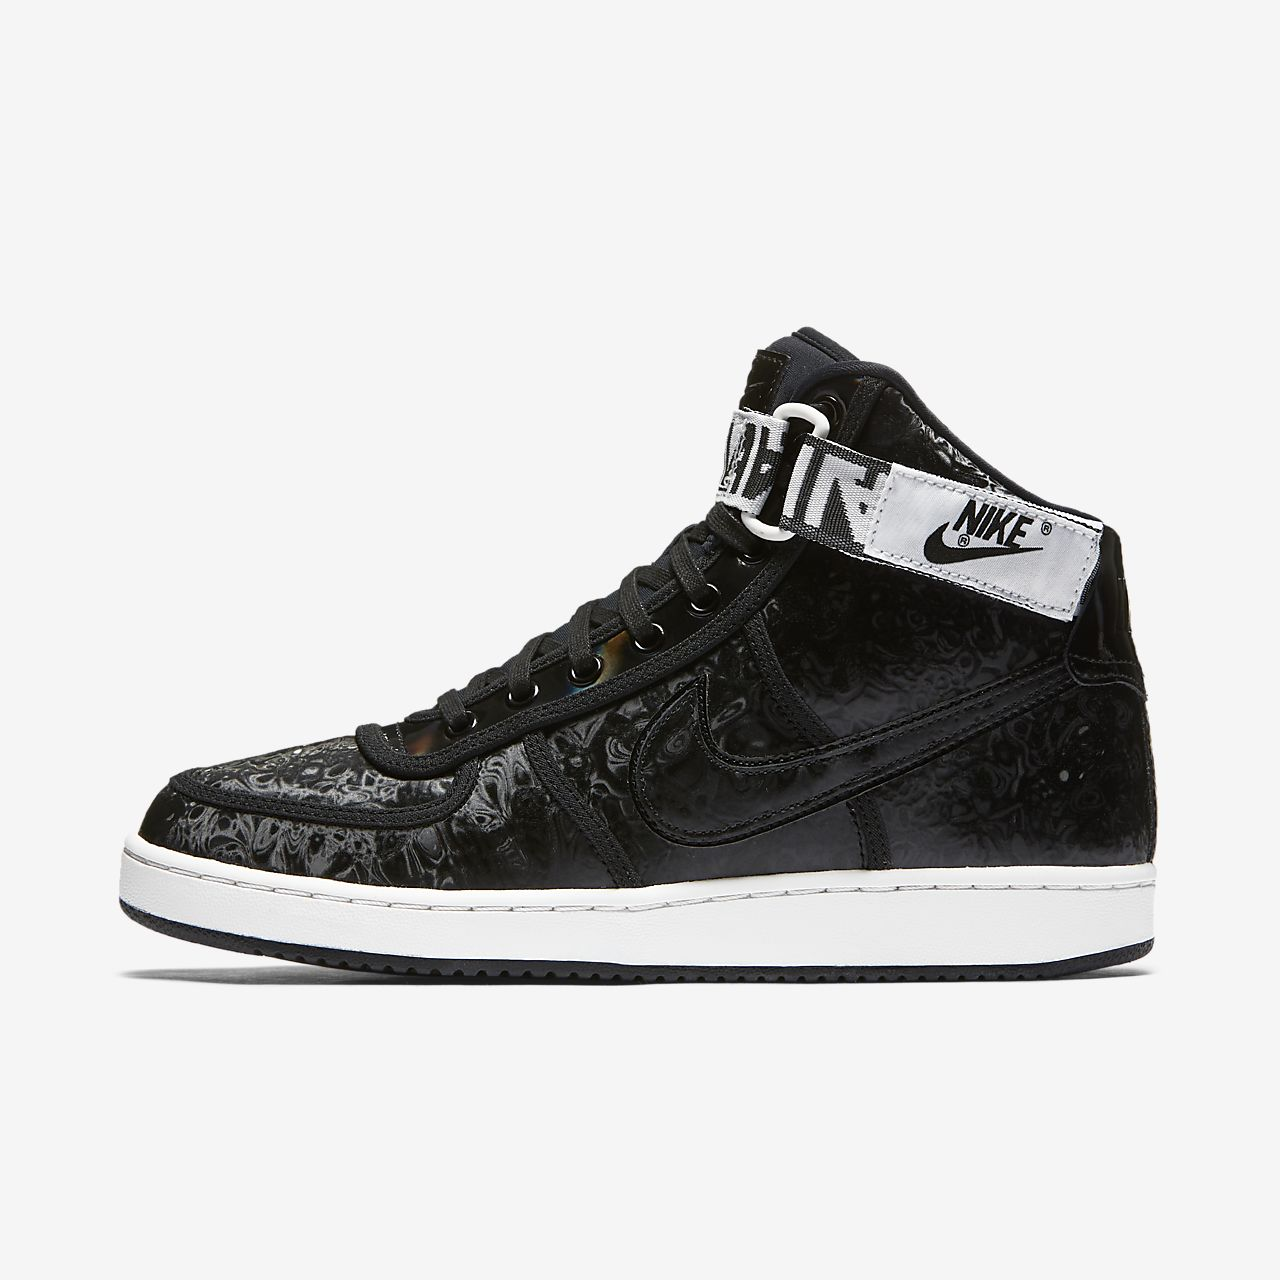 Nike Vandal High LX 女子运动鞋